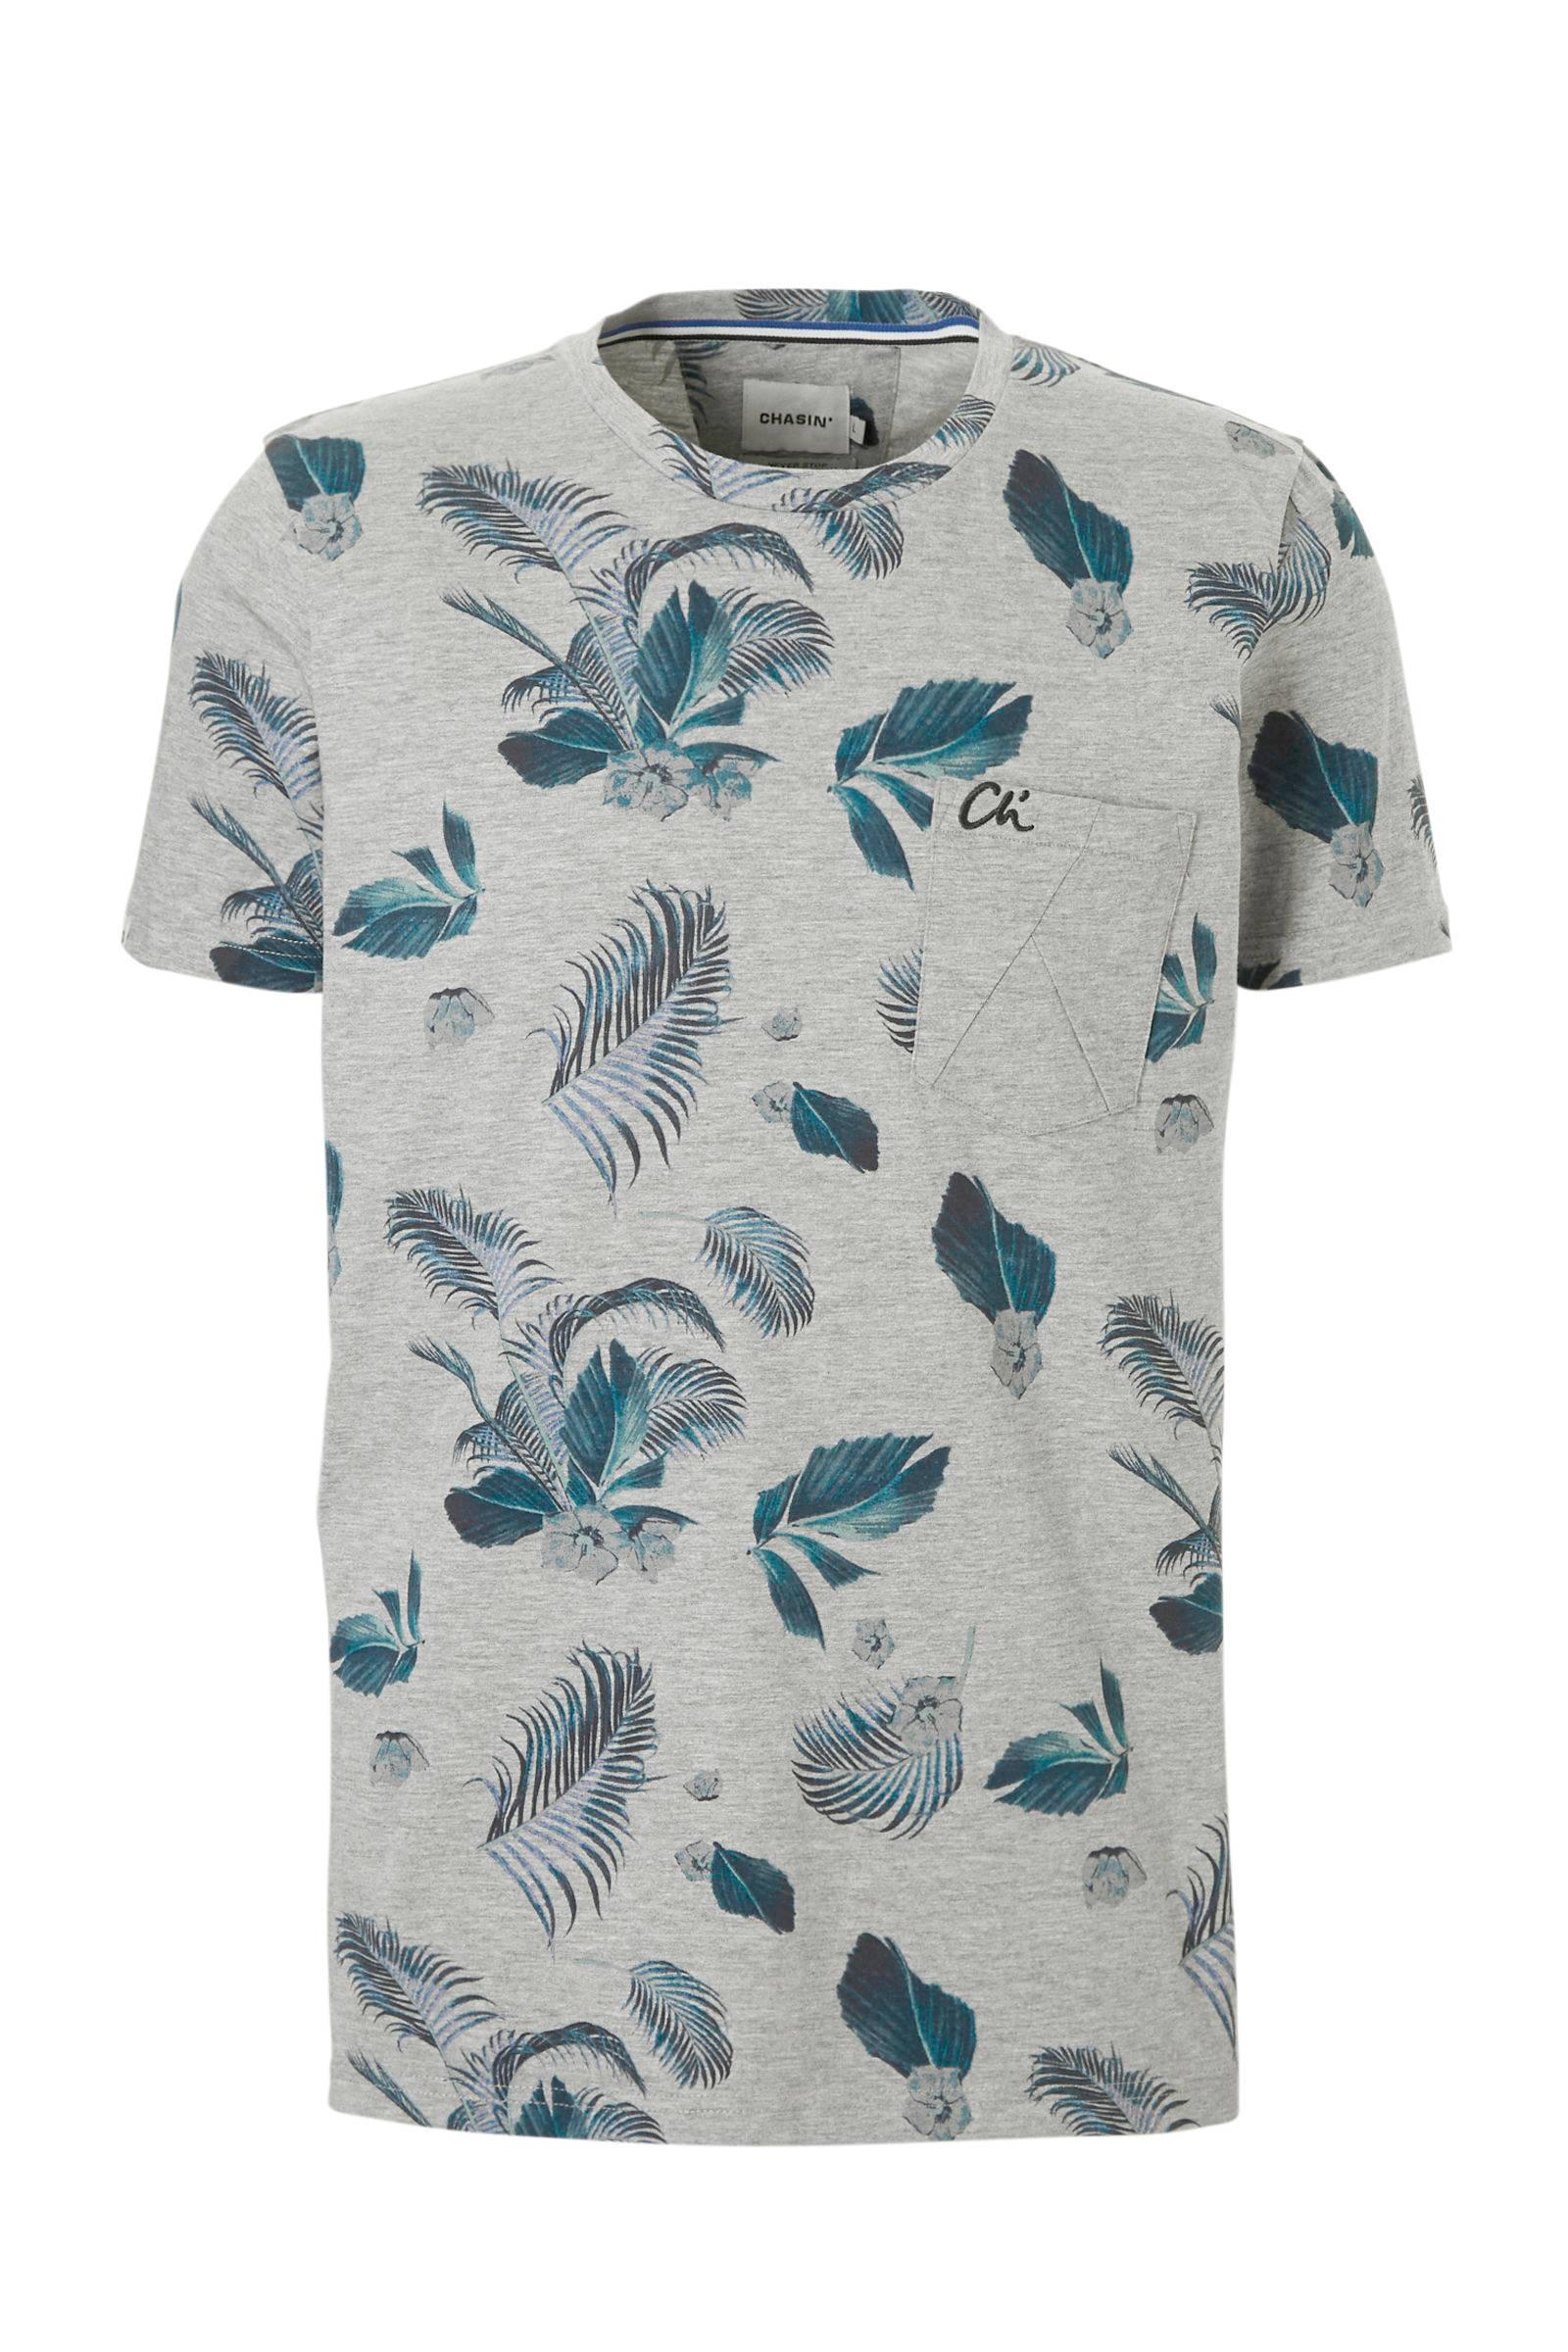 18e56e22d58 T-shirt